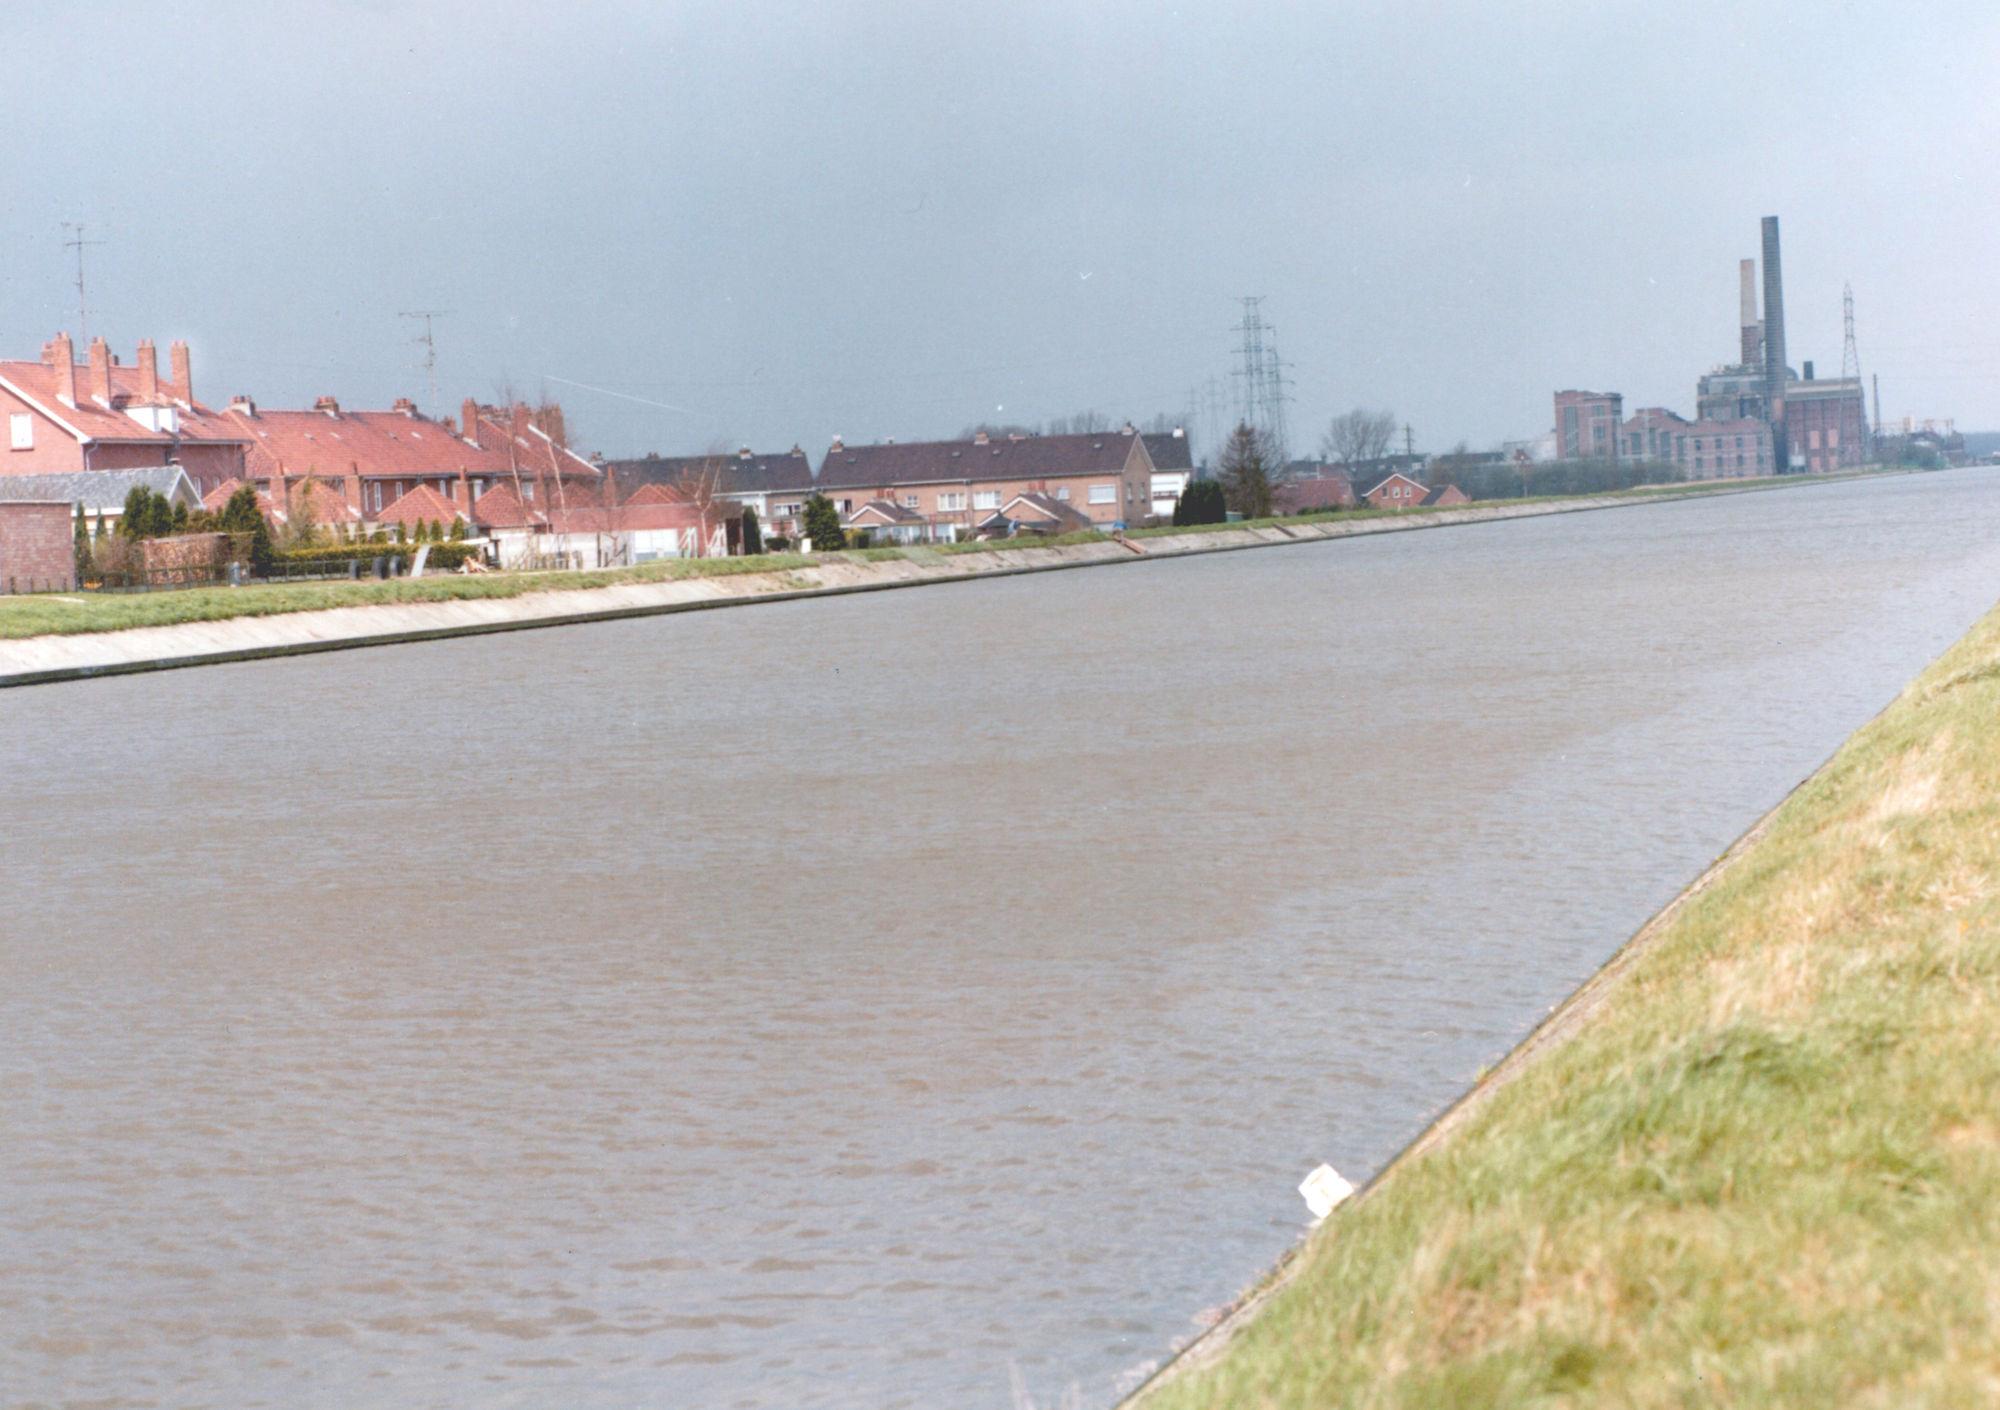 Kanaal Bossuit-Kortrijk in Zwevegem-Knokke 1981